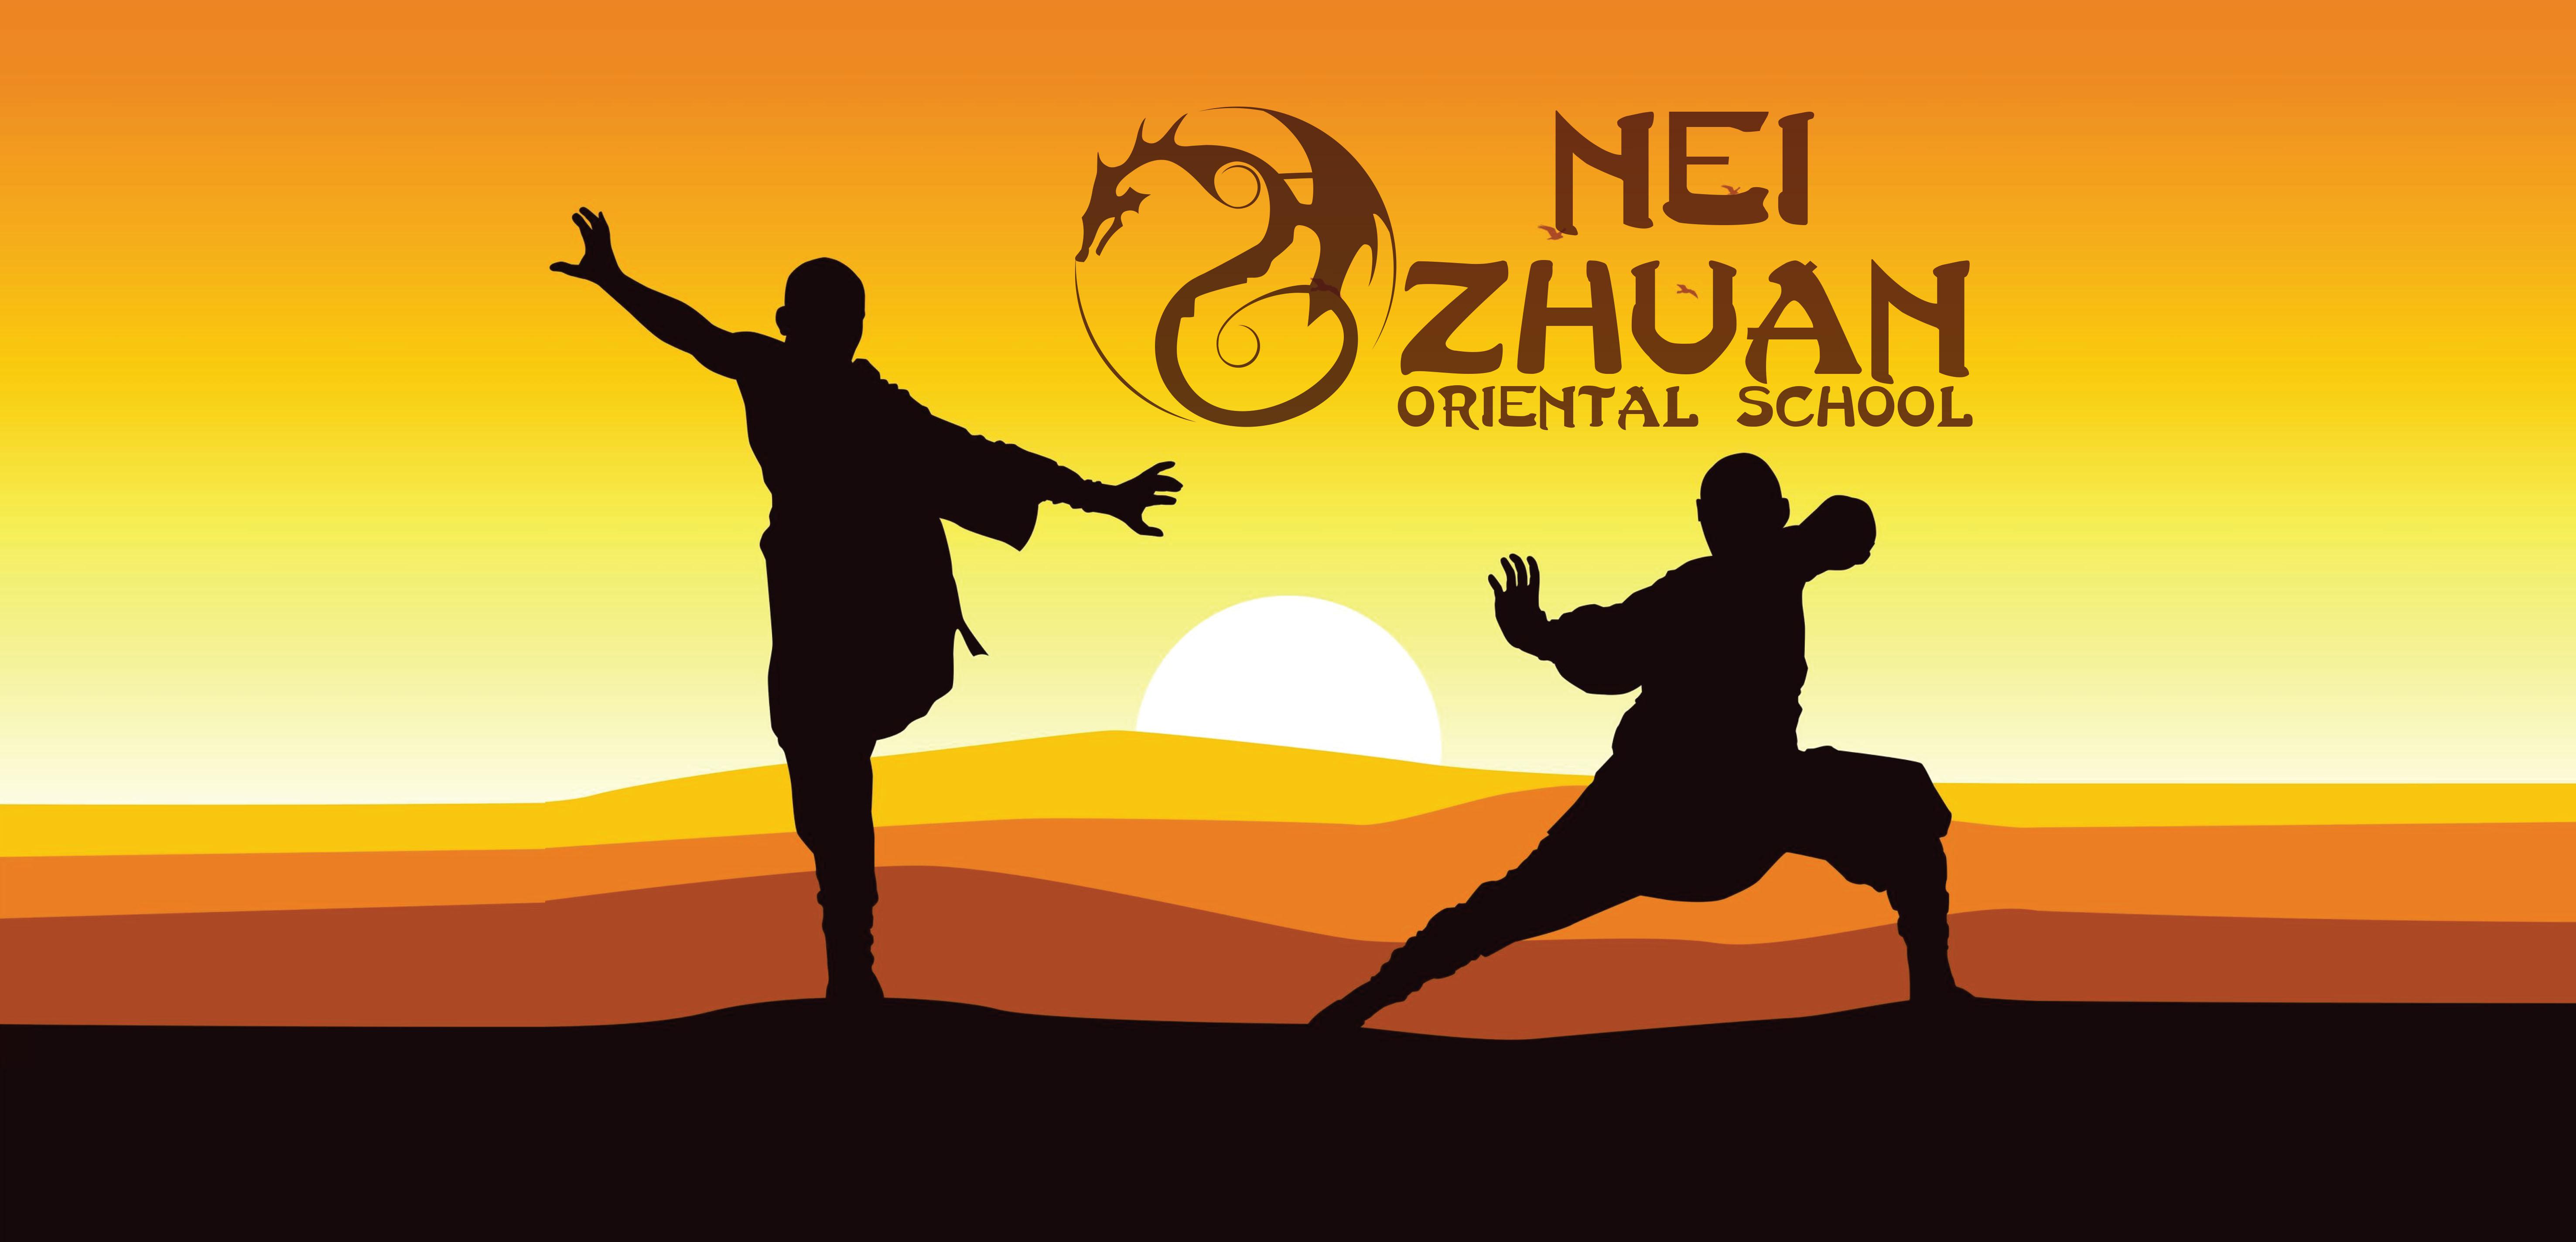 Nei-Zhuan